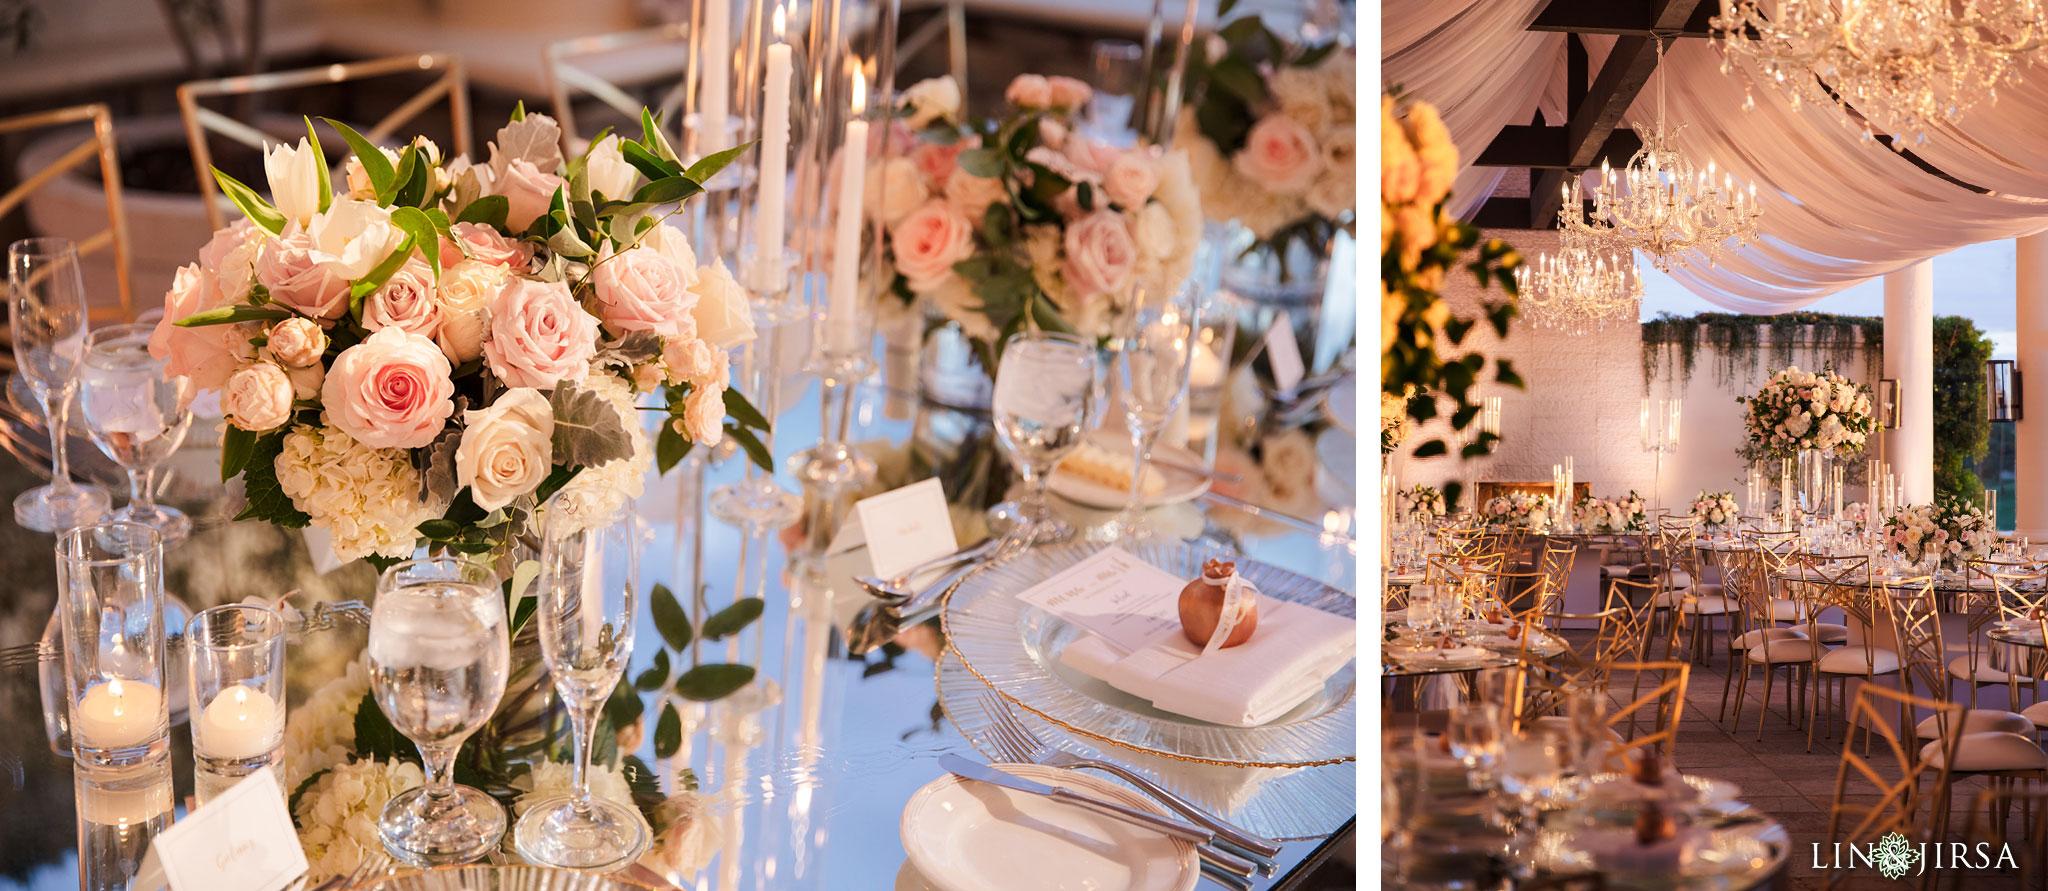 32 monarch beach resort laguna niguel persian wedding photography